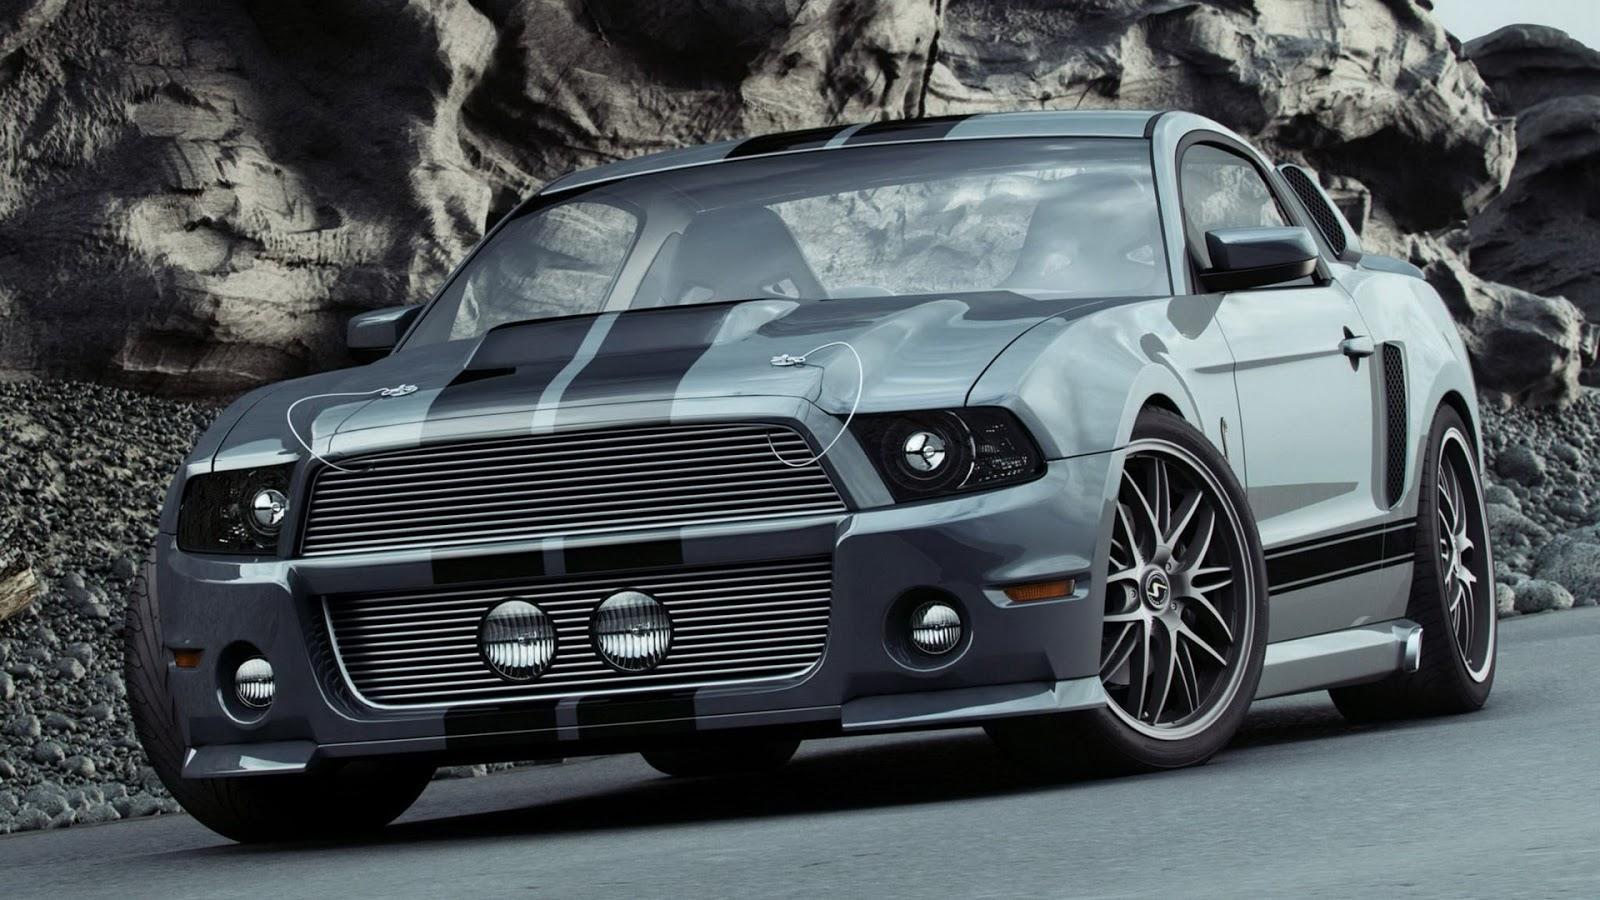 Ford mustang eleanor wallpaper